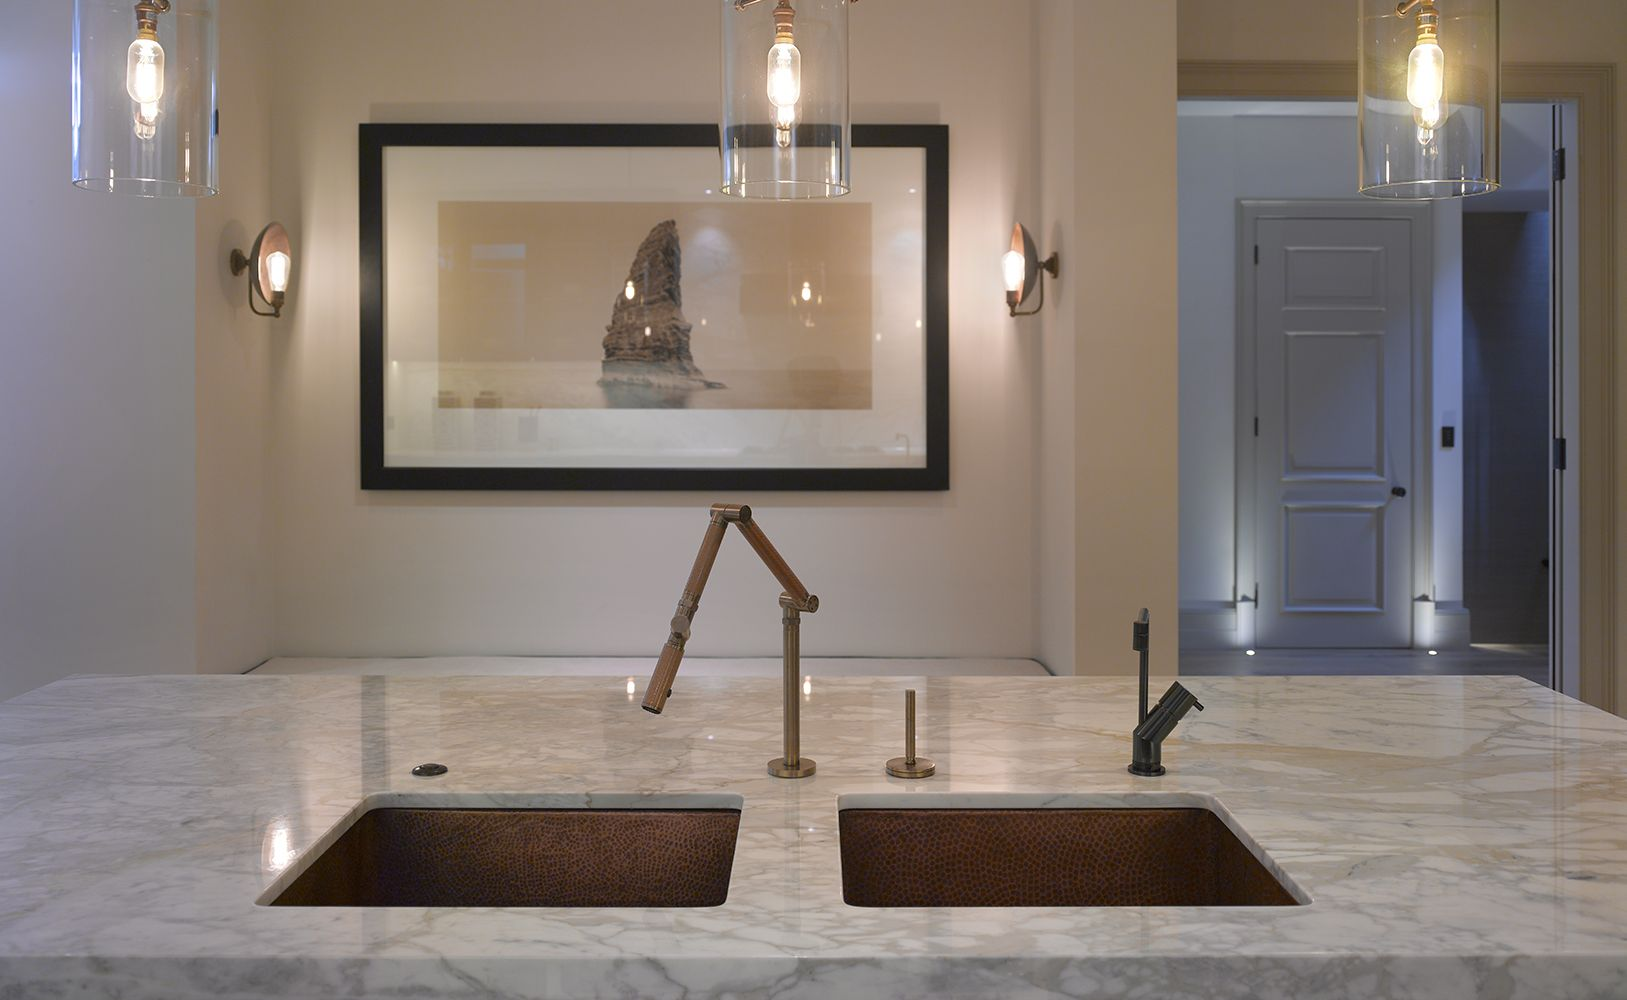 Roundhouse bespoke luxury kitchen work surface in